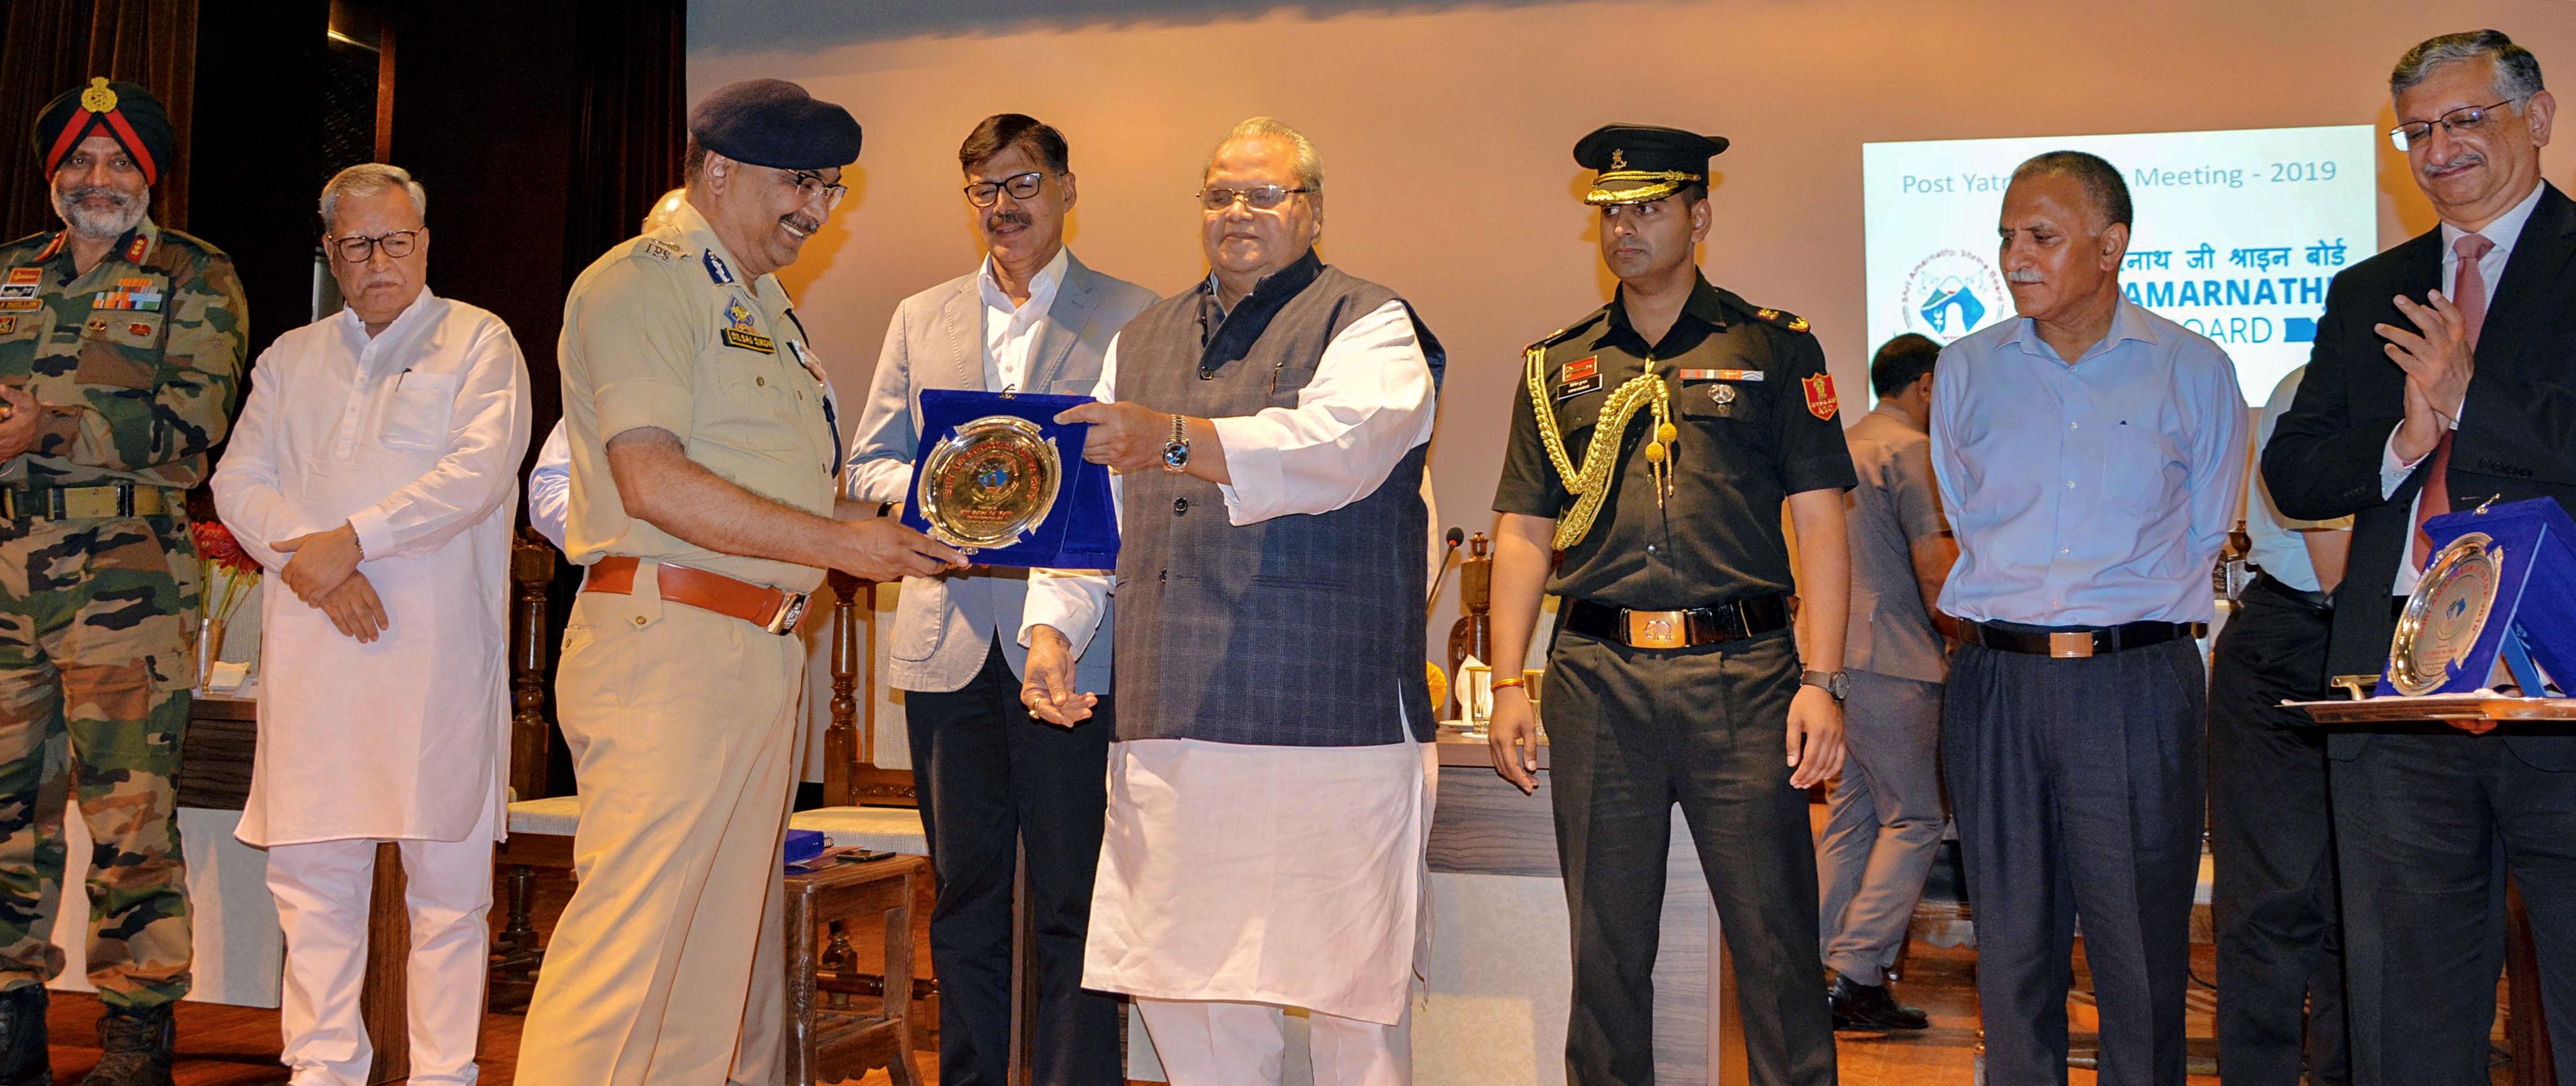 Jammu and Kashmir governor Satya Pal Malik felicitates state police chief Dilbagh Singh for conducting successful Amarnath Yatra at Raj Bhavan on August 28.